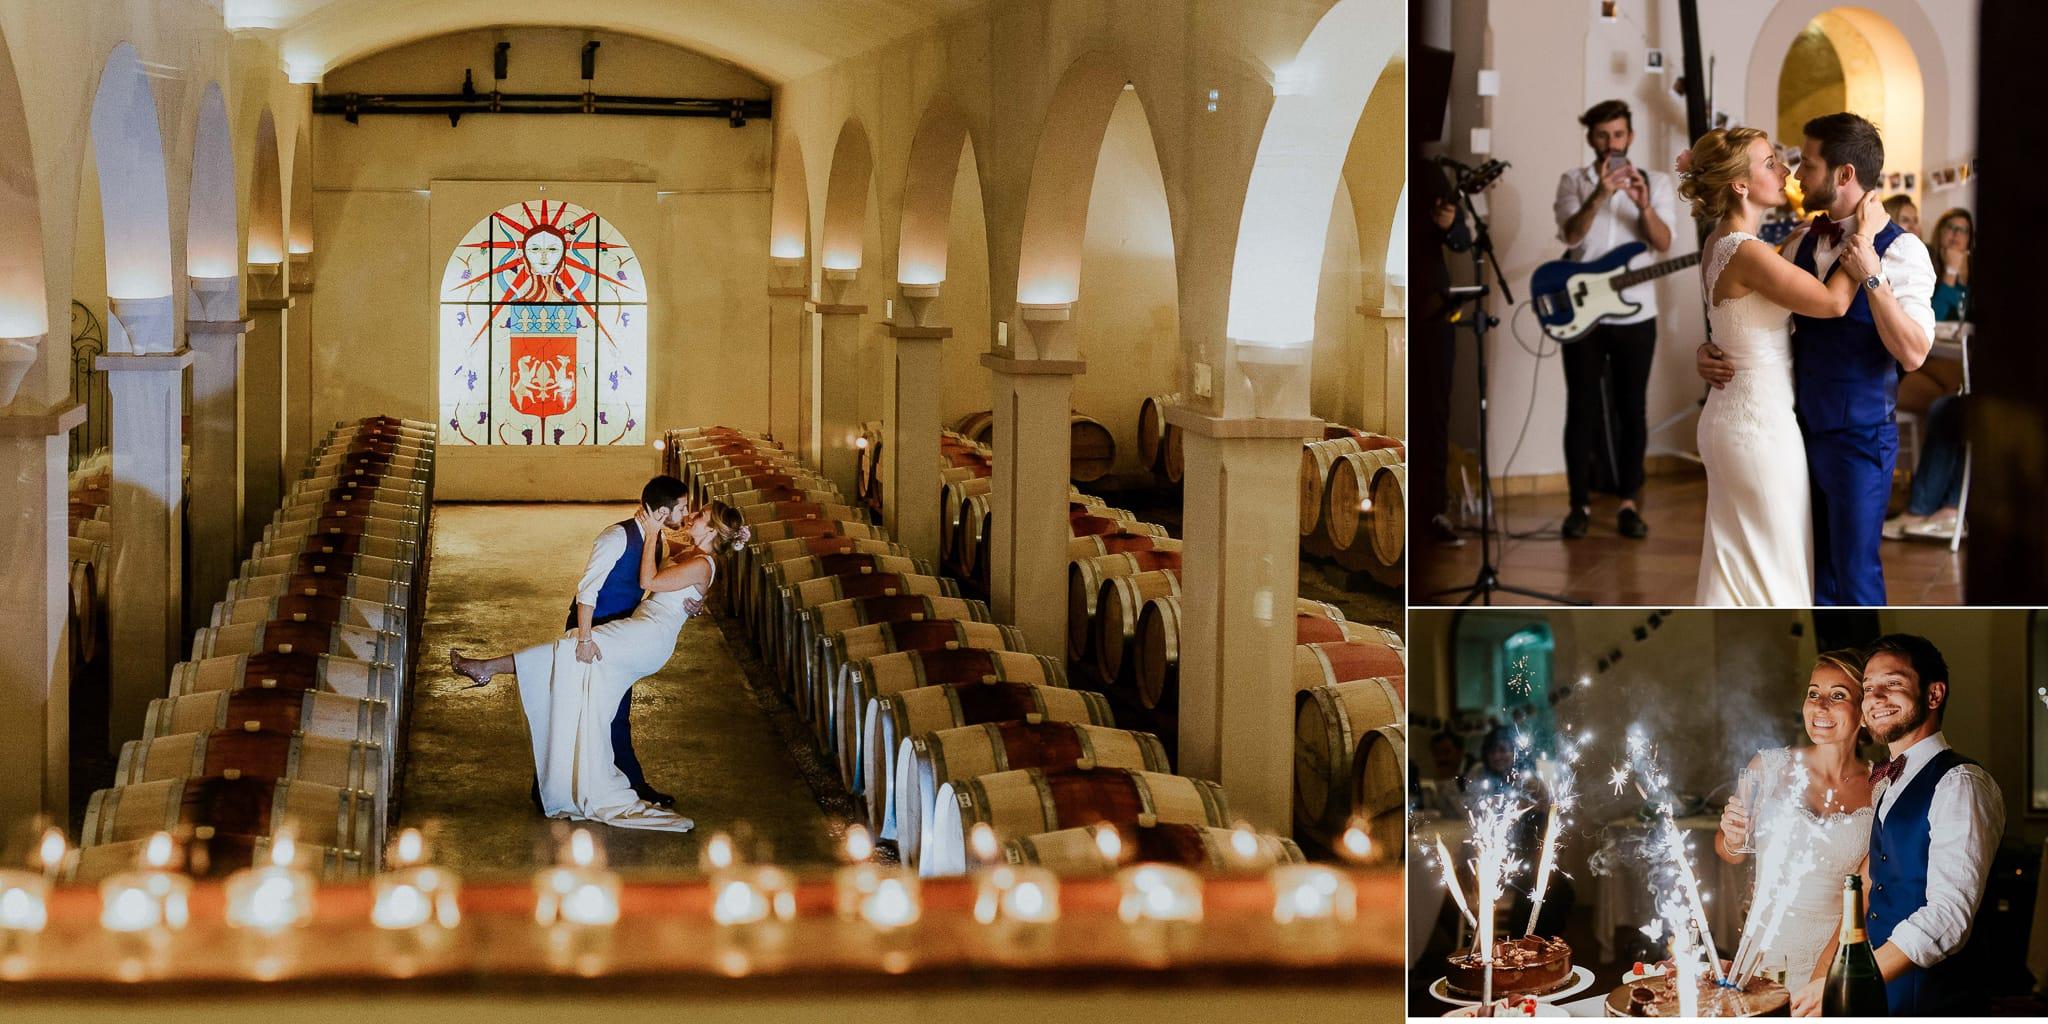 Costi-Moiceanu-Photographer-CM-Photography-Wedding-Mariage-French-Riviera-Cote-D-Azur-Alpes-Maritimes-Weding-Album-Design-20